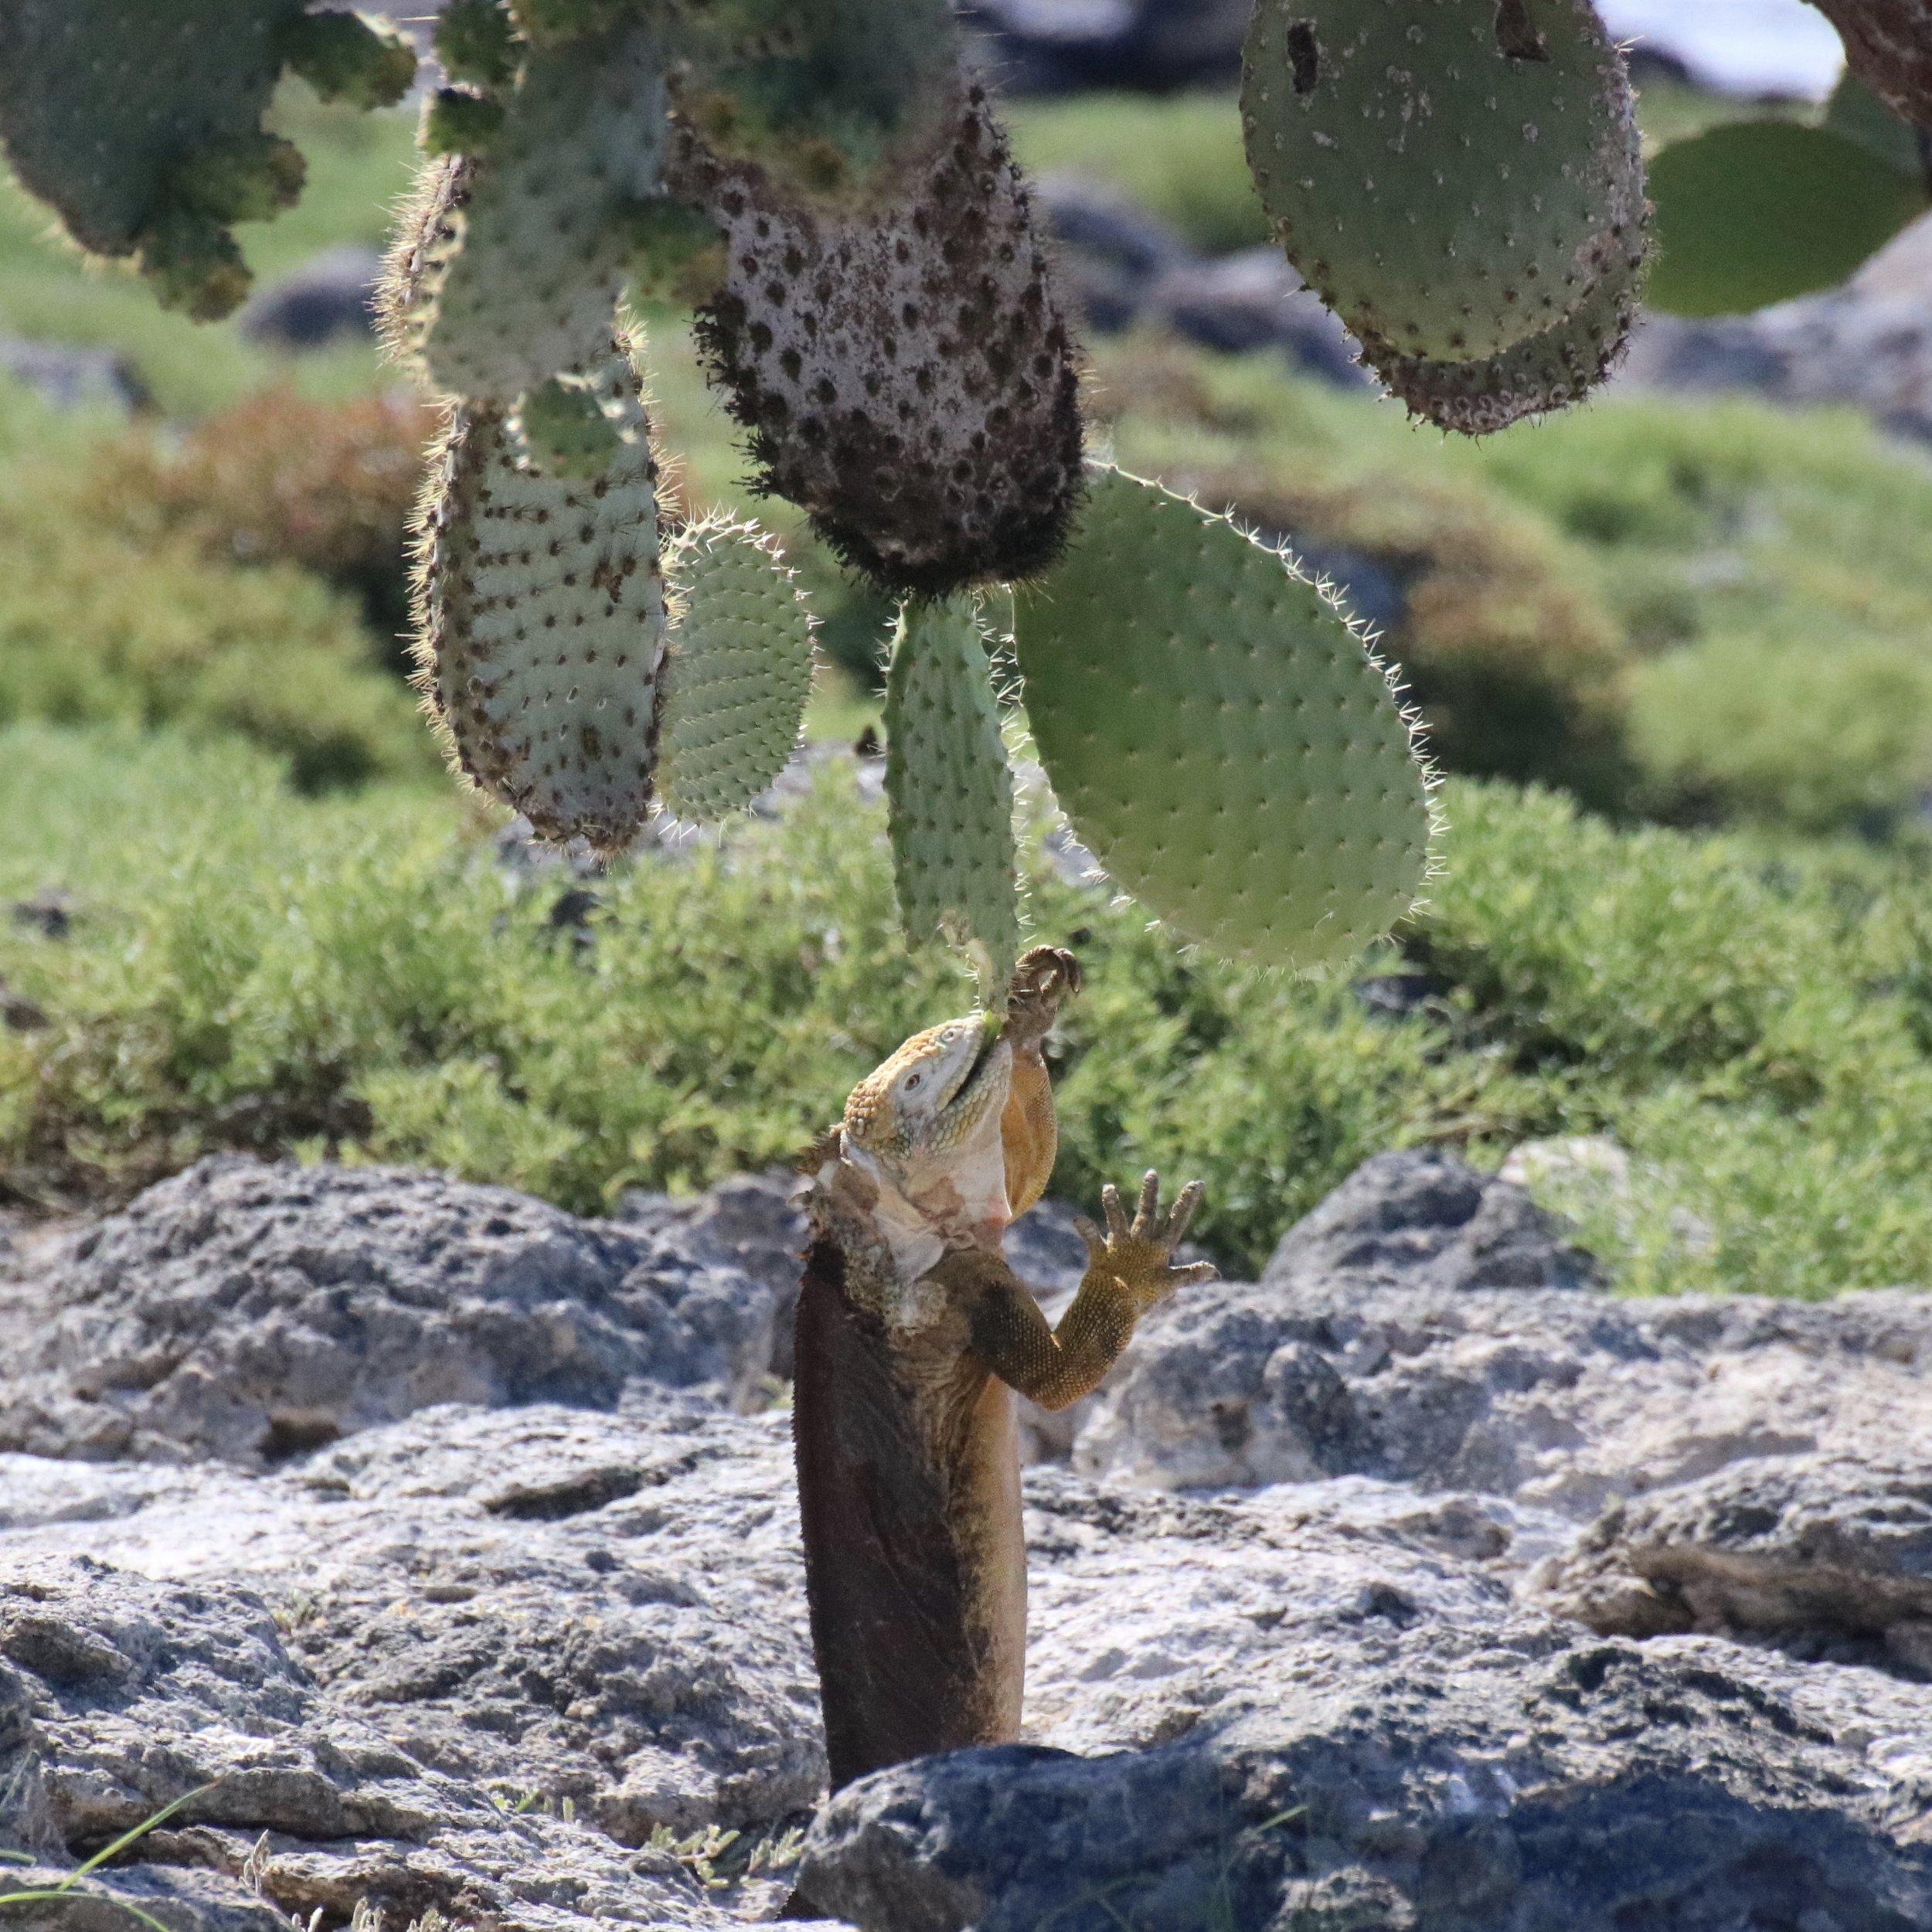 A land iguana reaching to eat a cactus;Santa Fe island